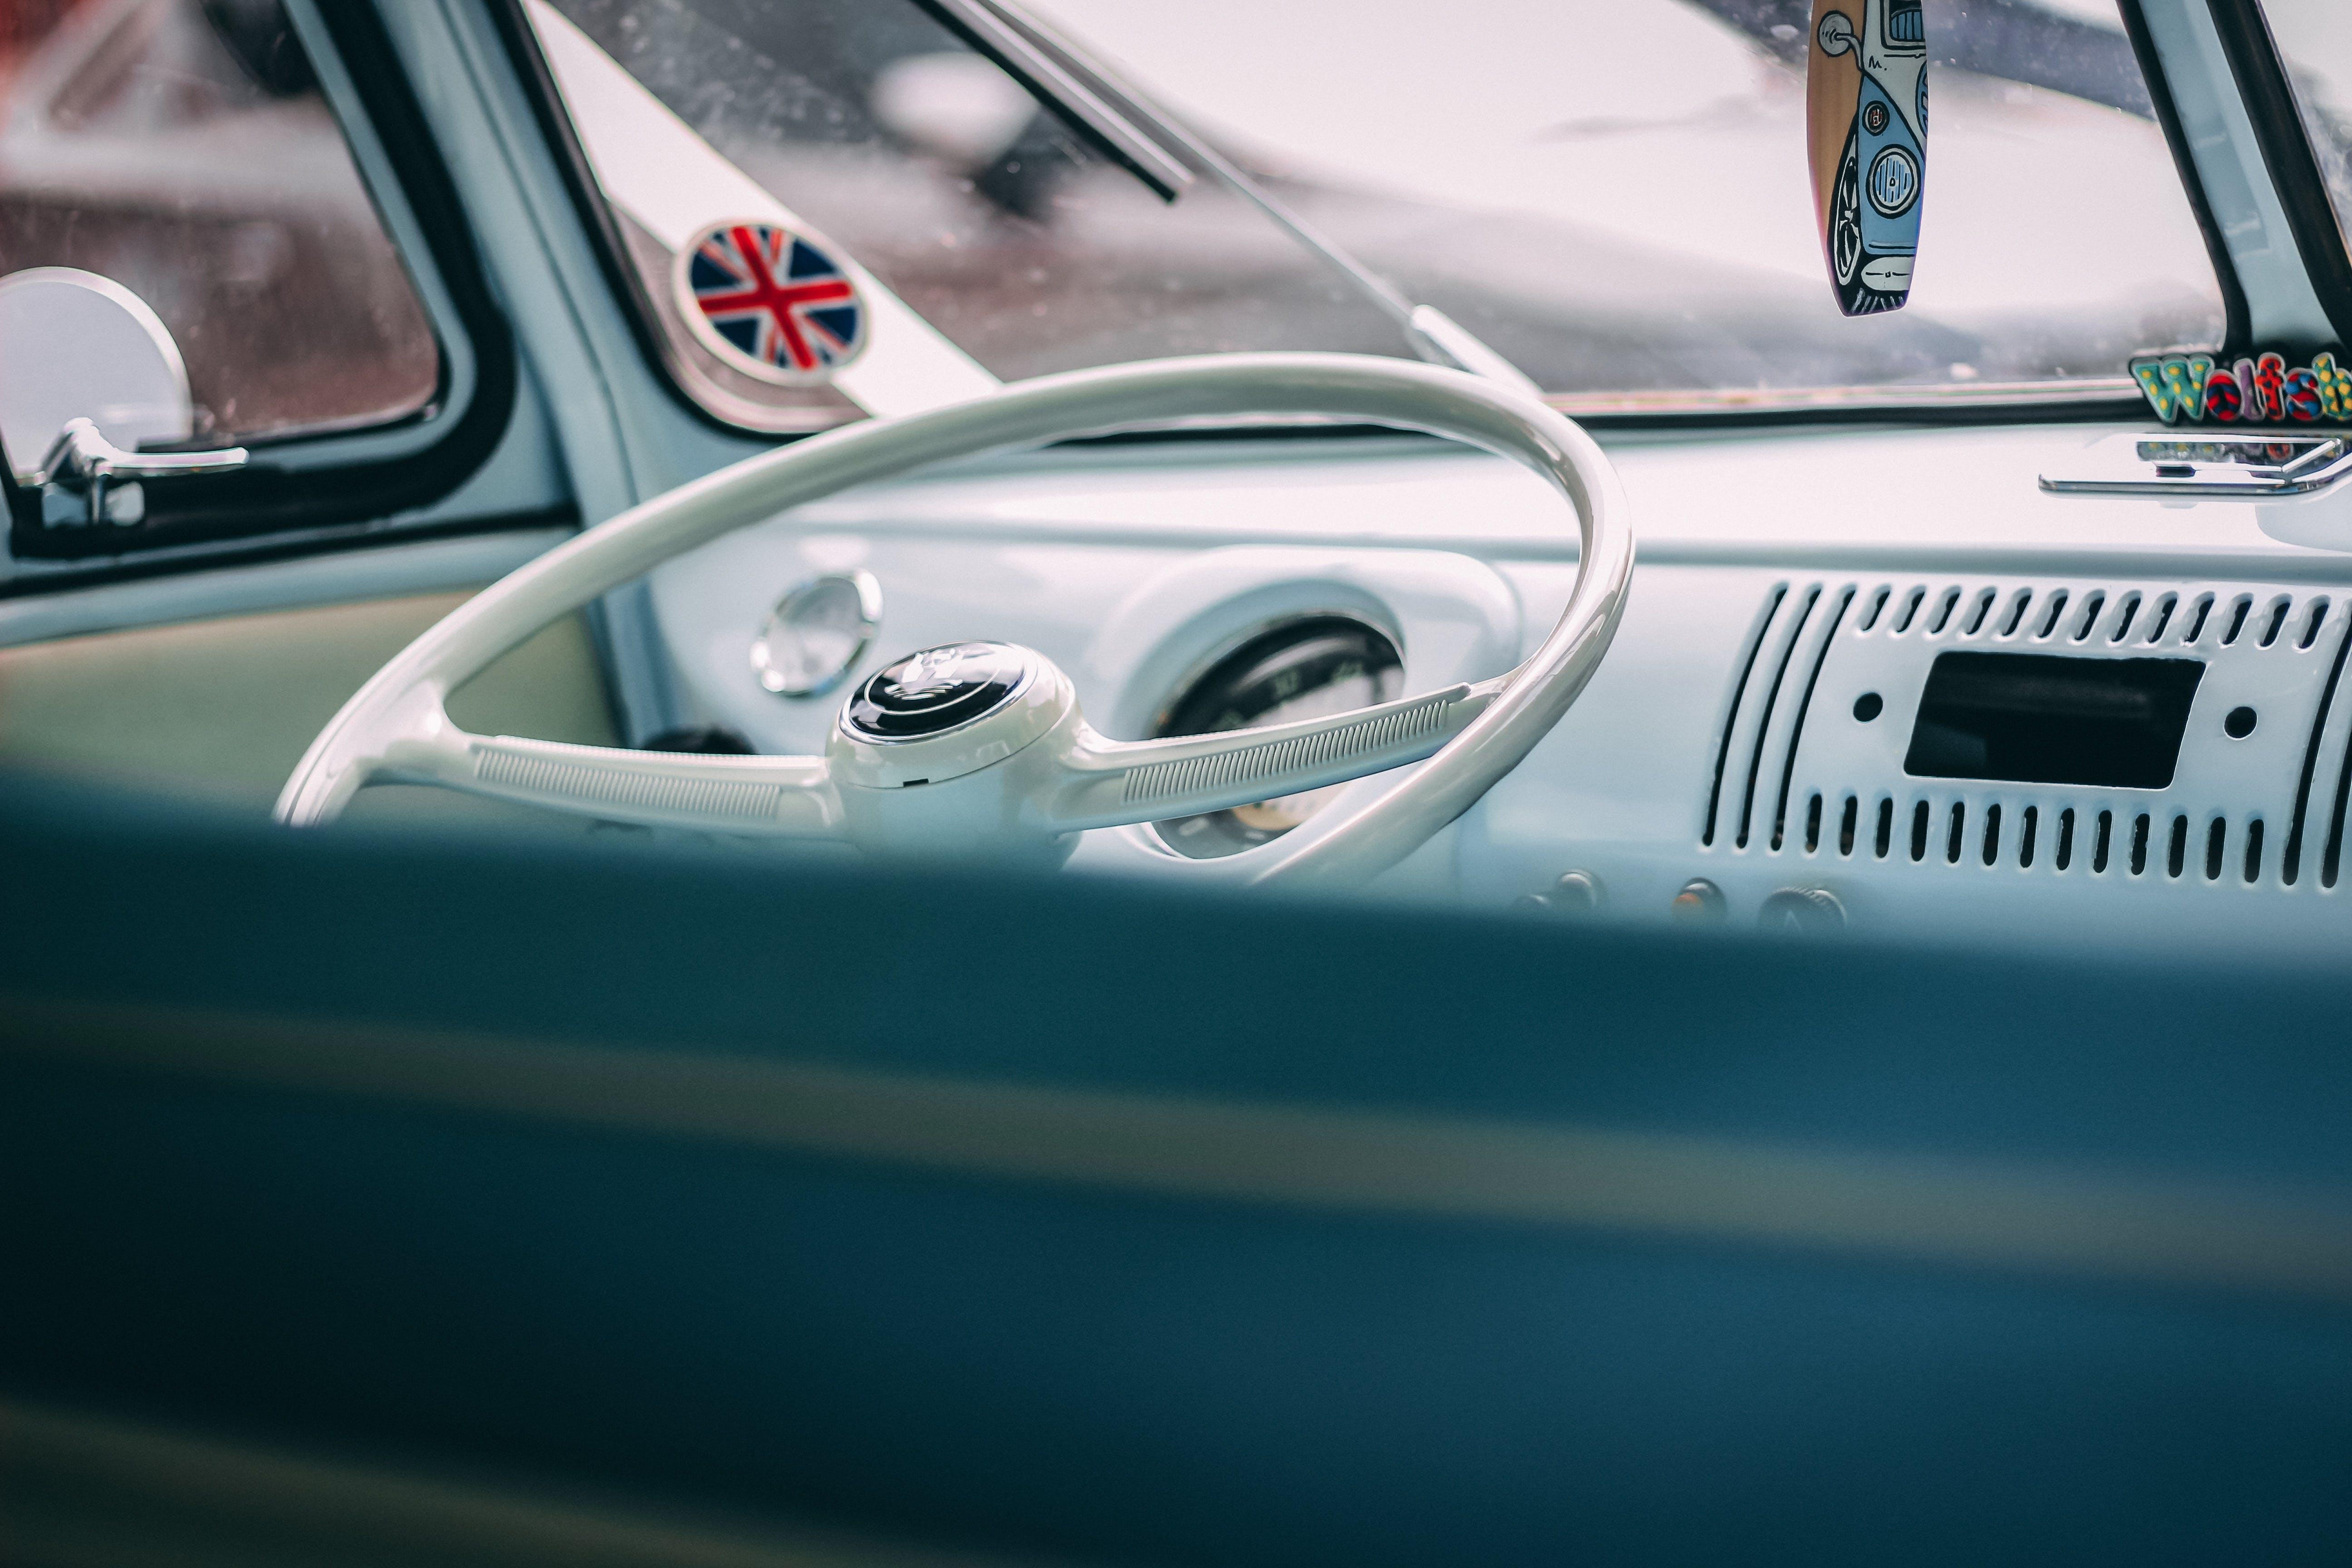 Classic White Vehicle Steering Wheel